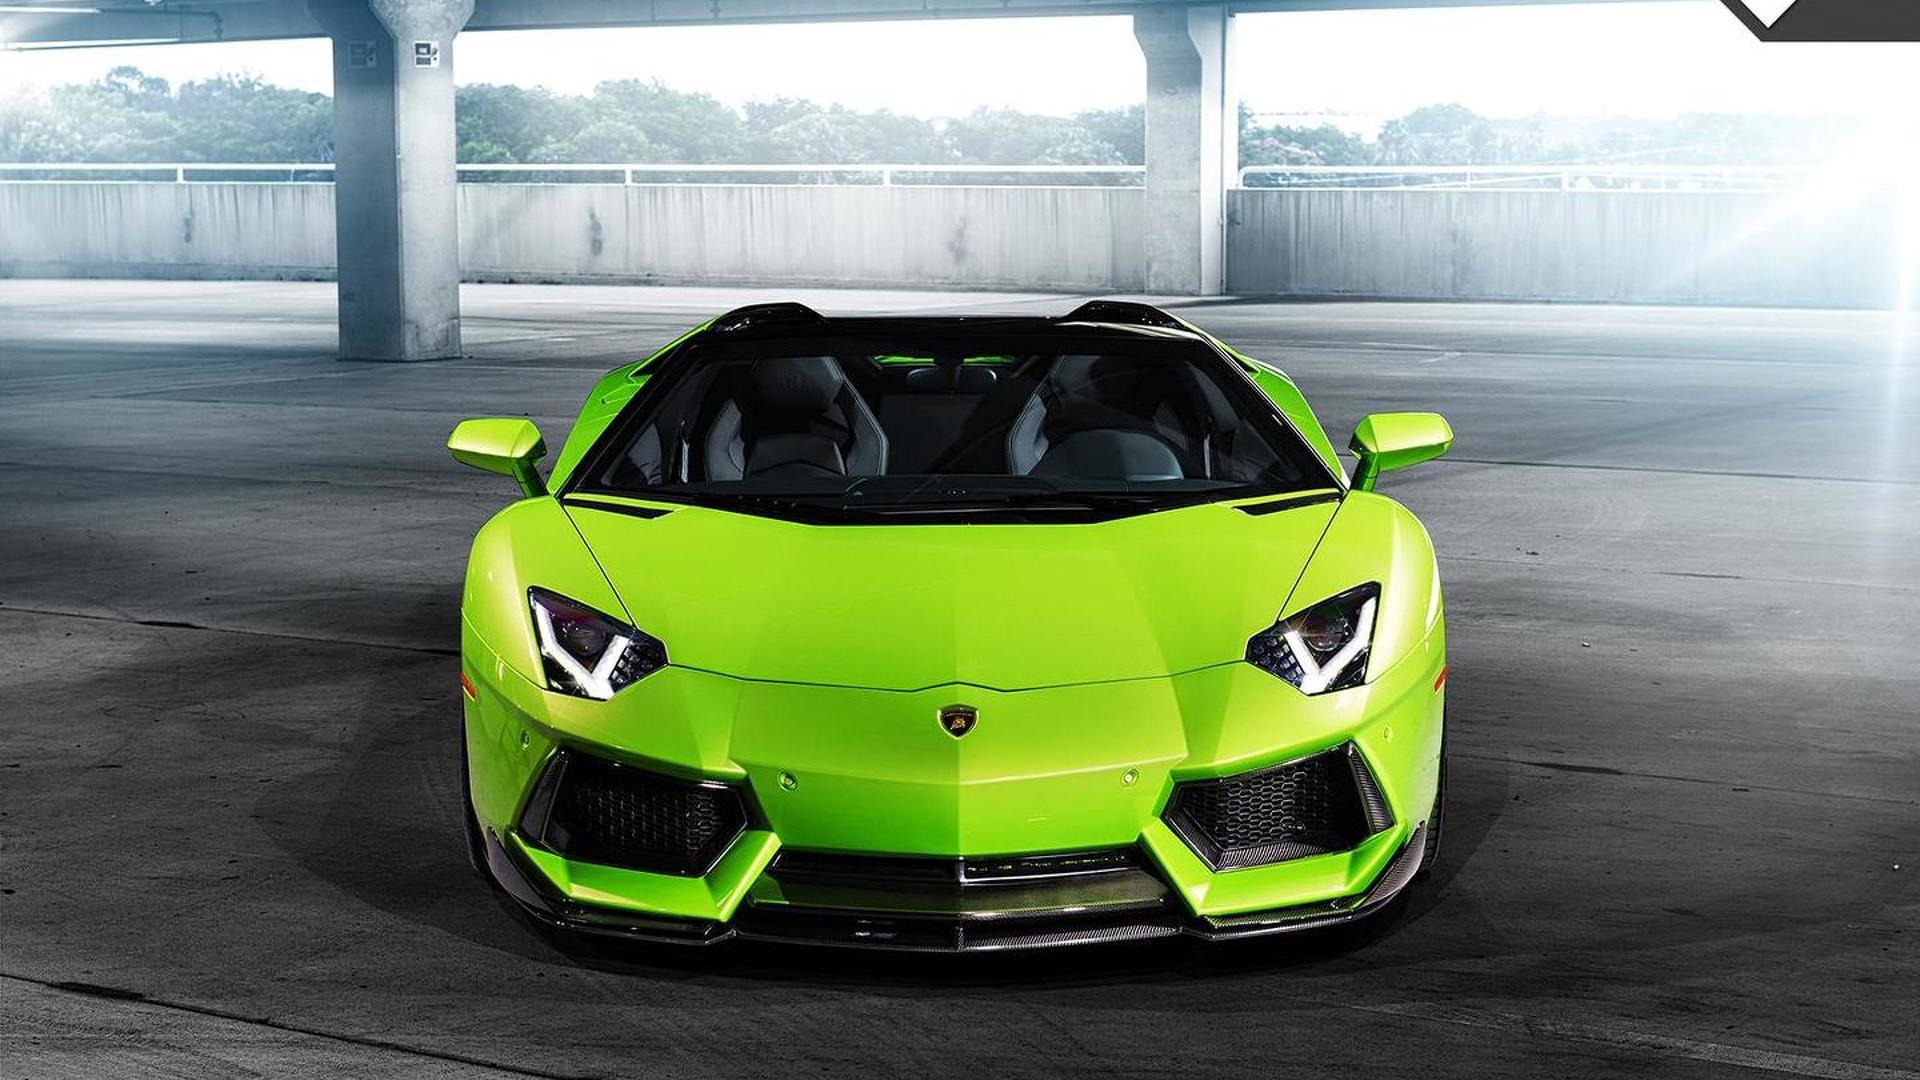 Зелёная Lamborghini Aventador-V Roadster The Hulk